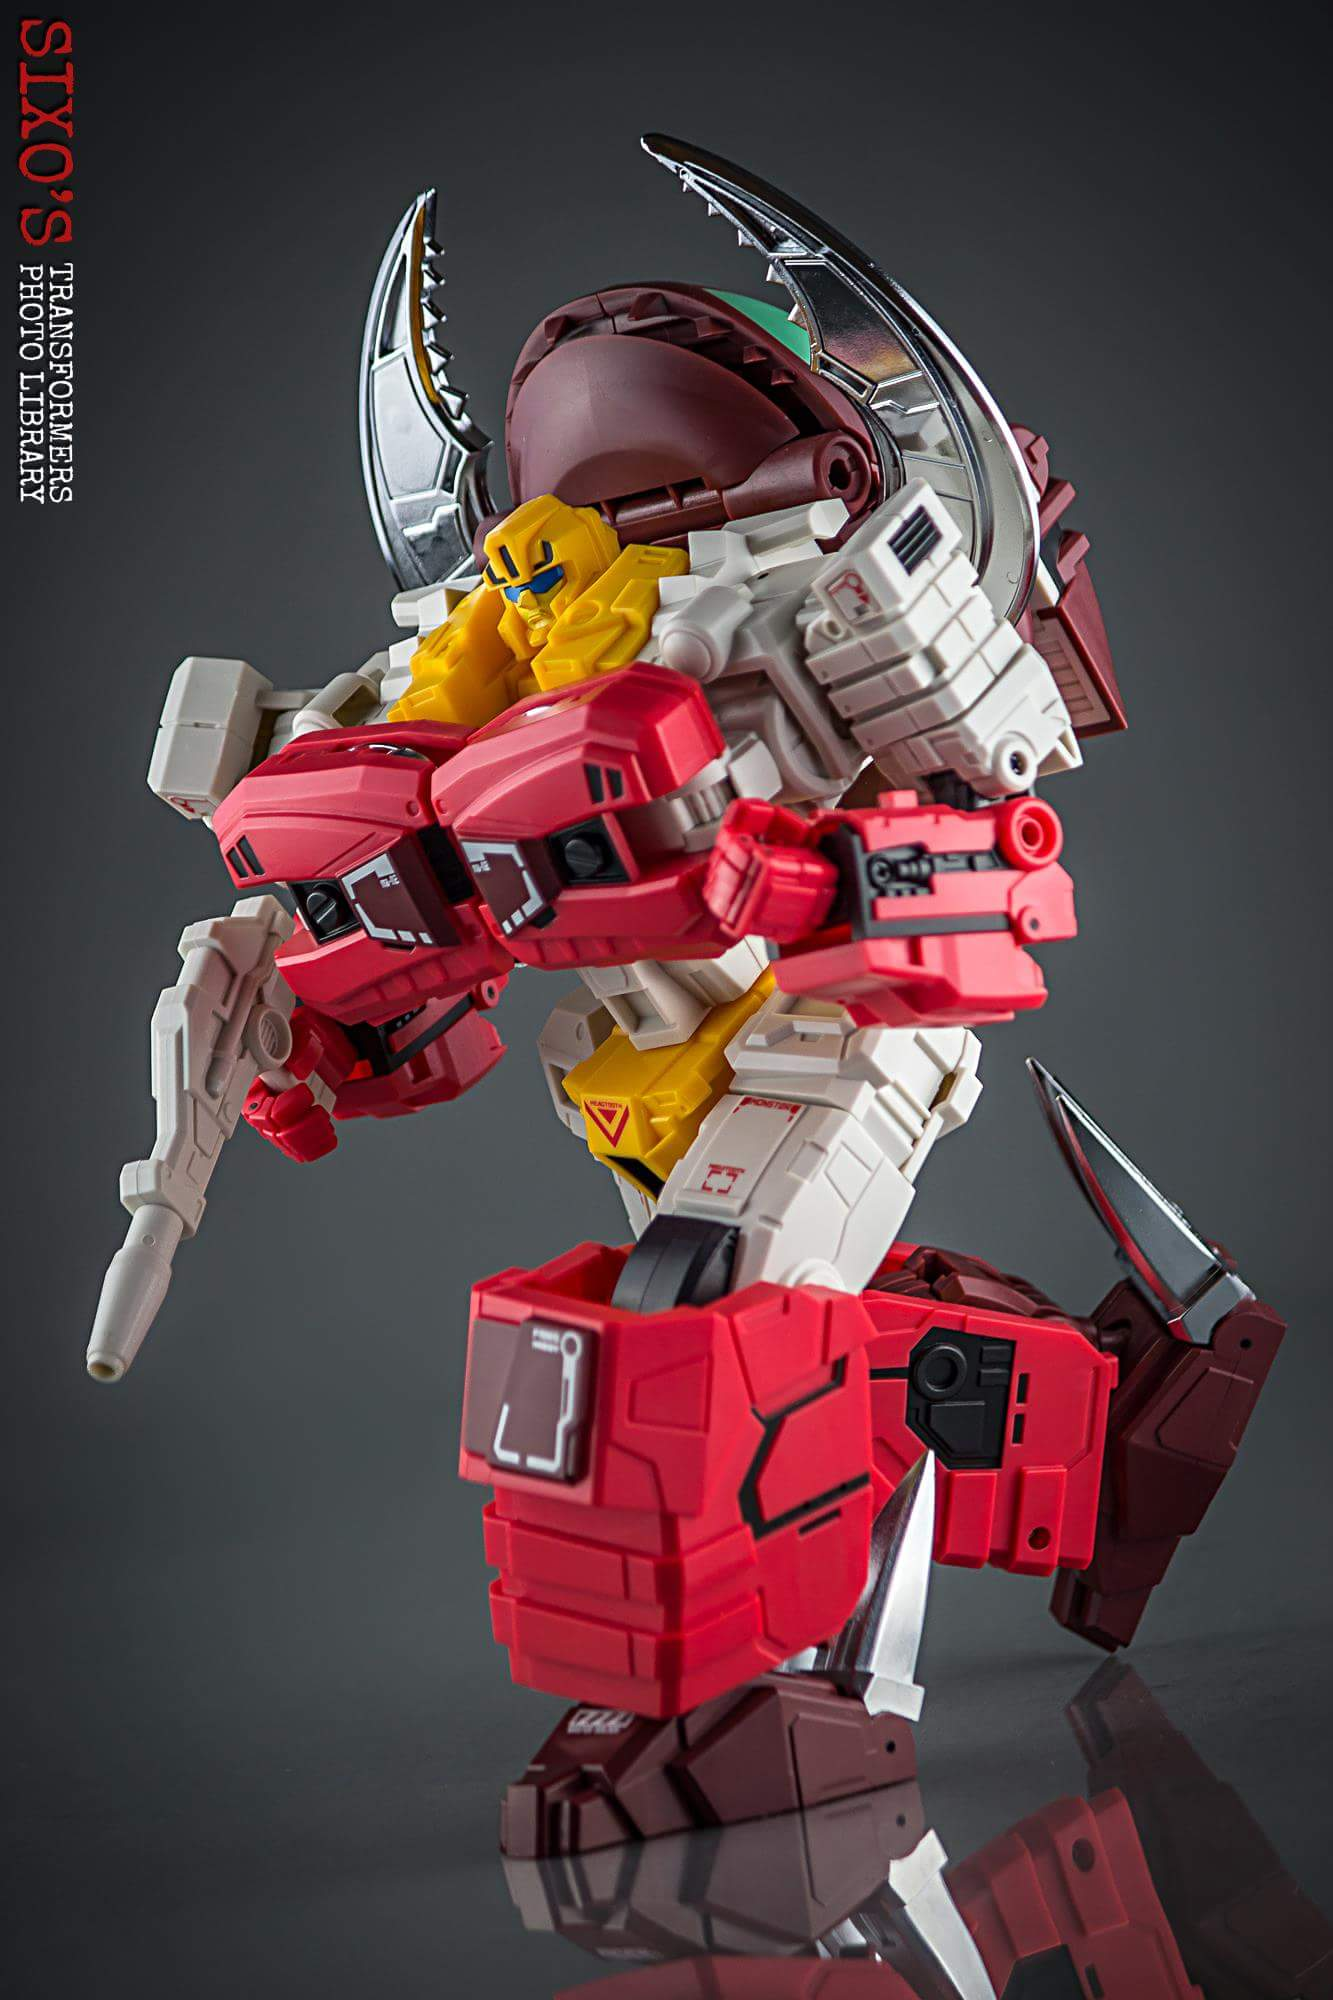 [FansHobby] Produit Tiers - Master Builder MB-02/03/05 - aka Monsterbots/Monstrebots - Page 2 NDca5x7k